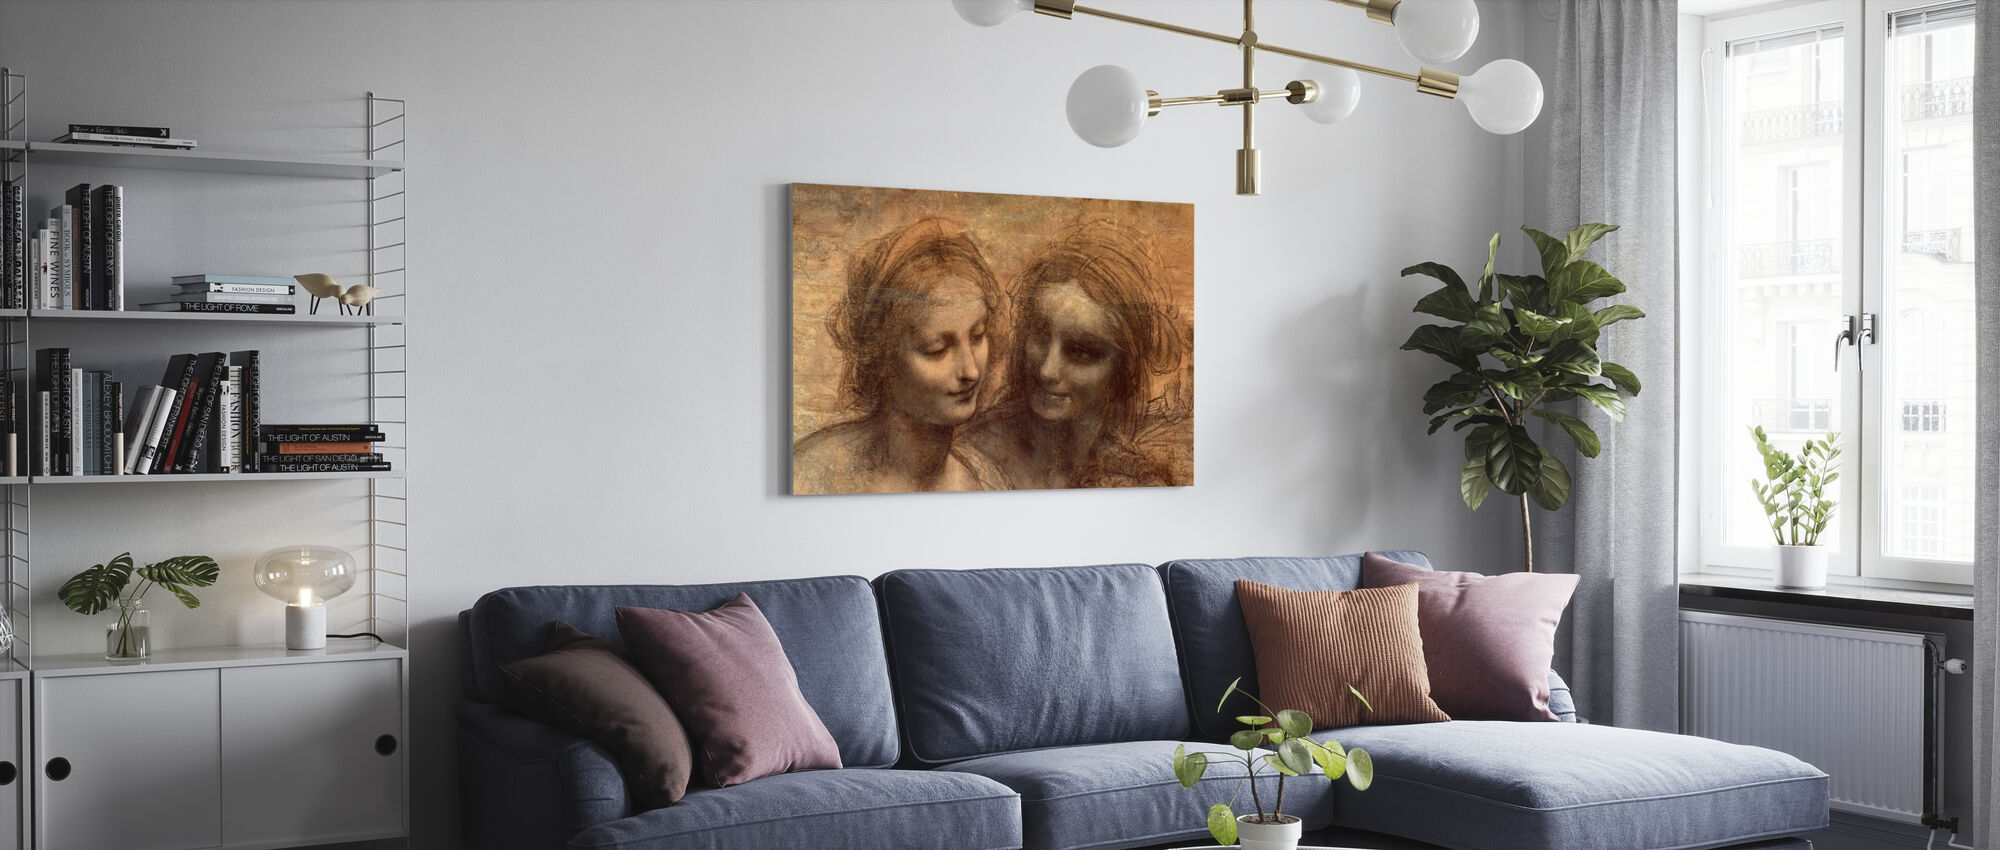 Virgin and Child - Leonardo da Vinci - Canvas print - Living Room